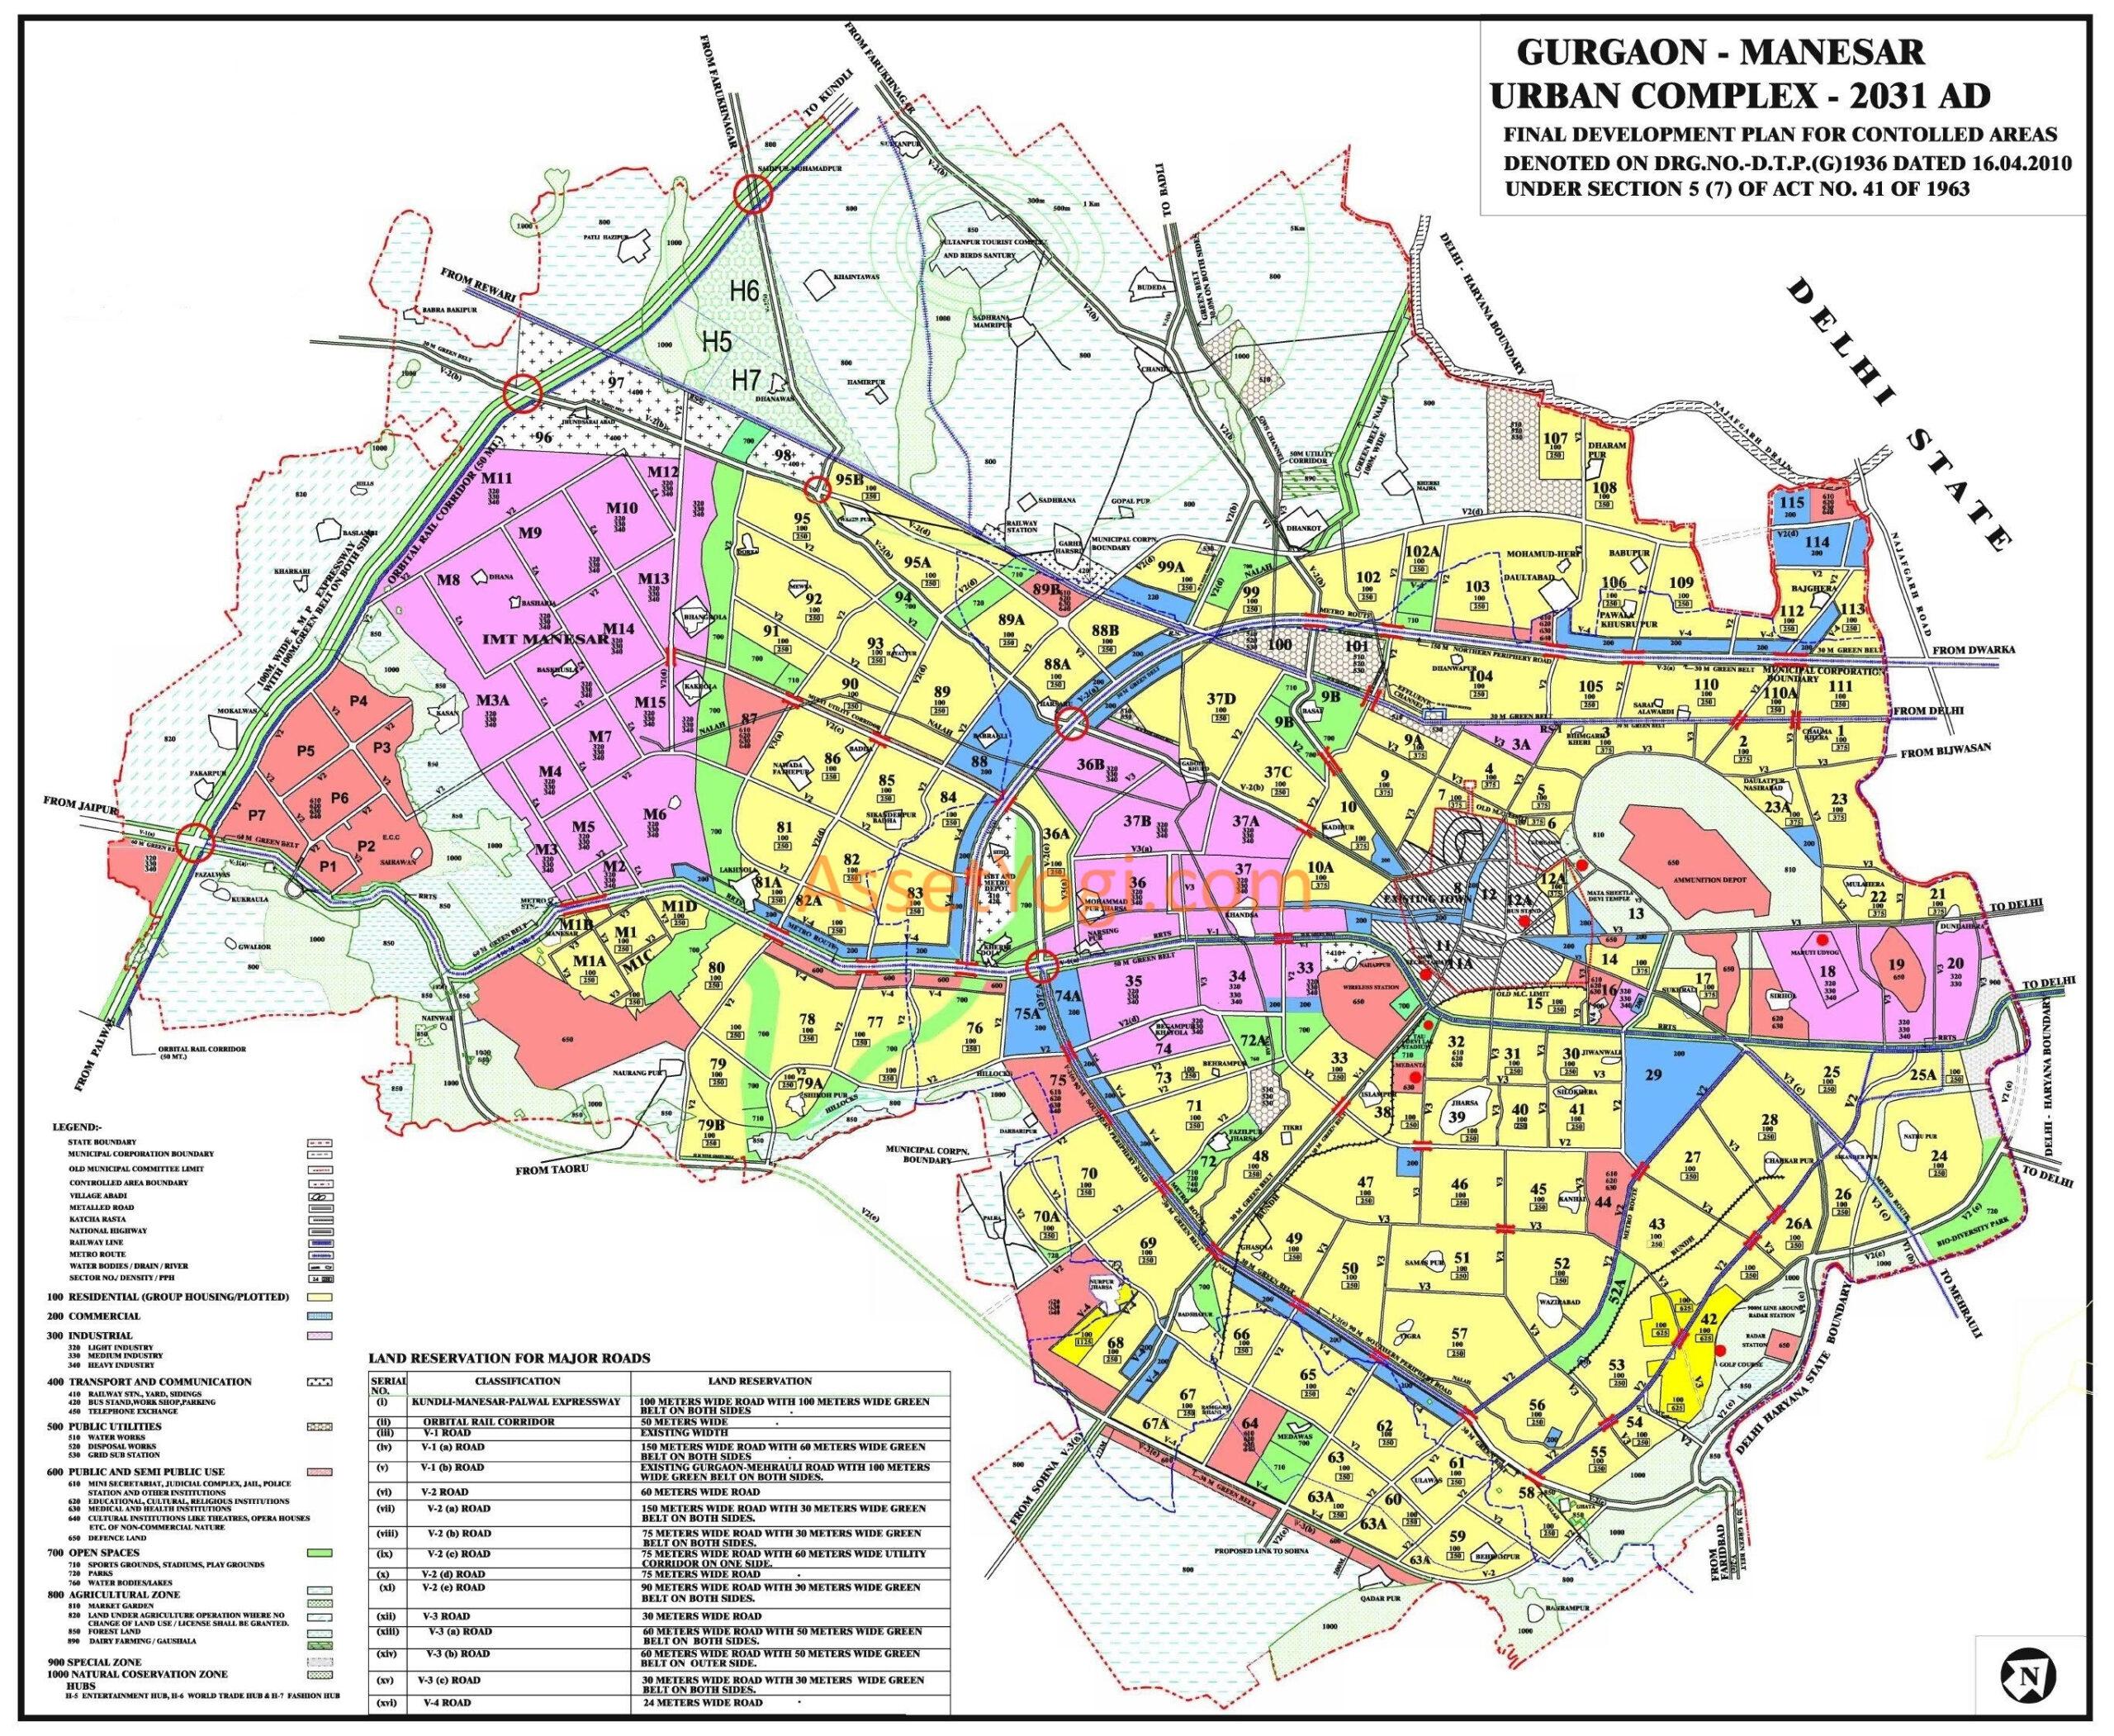 Gurgaon Master Plan 2031, 2025 & 2021 - Map, Summary & Download!